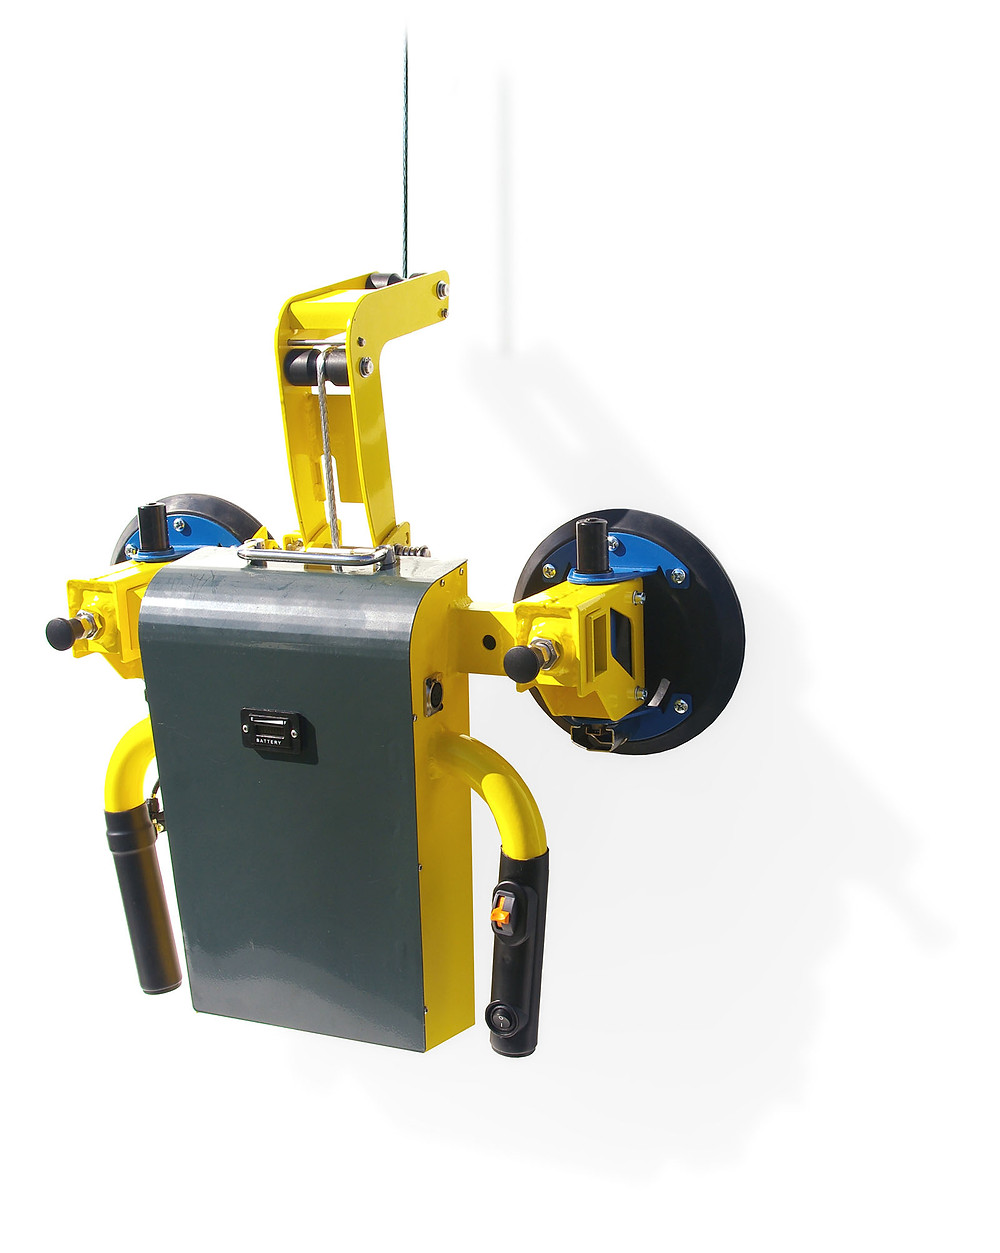 Product photo of the Upclimber hoist